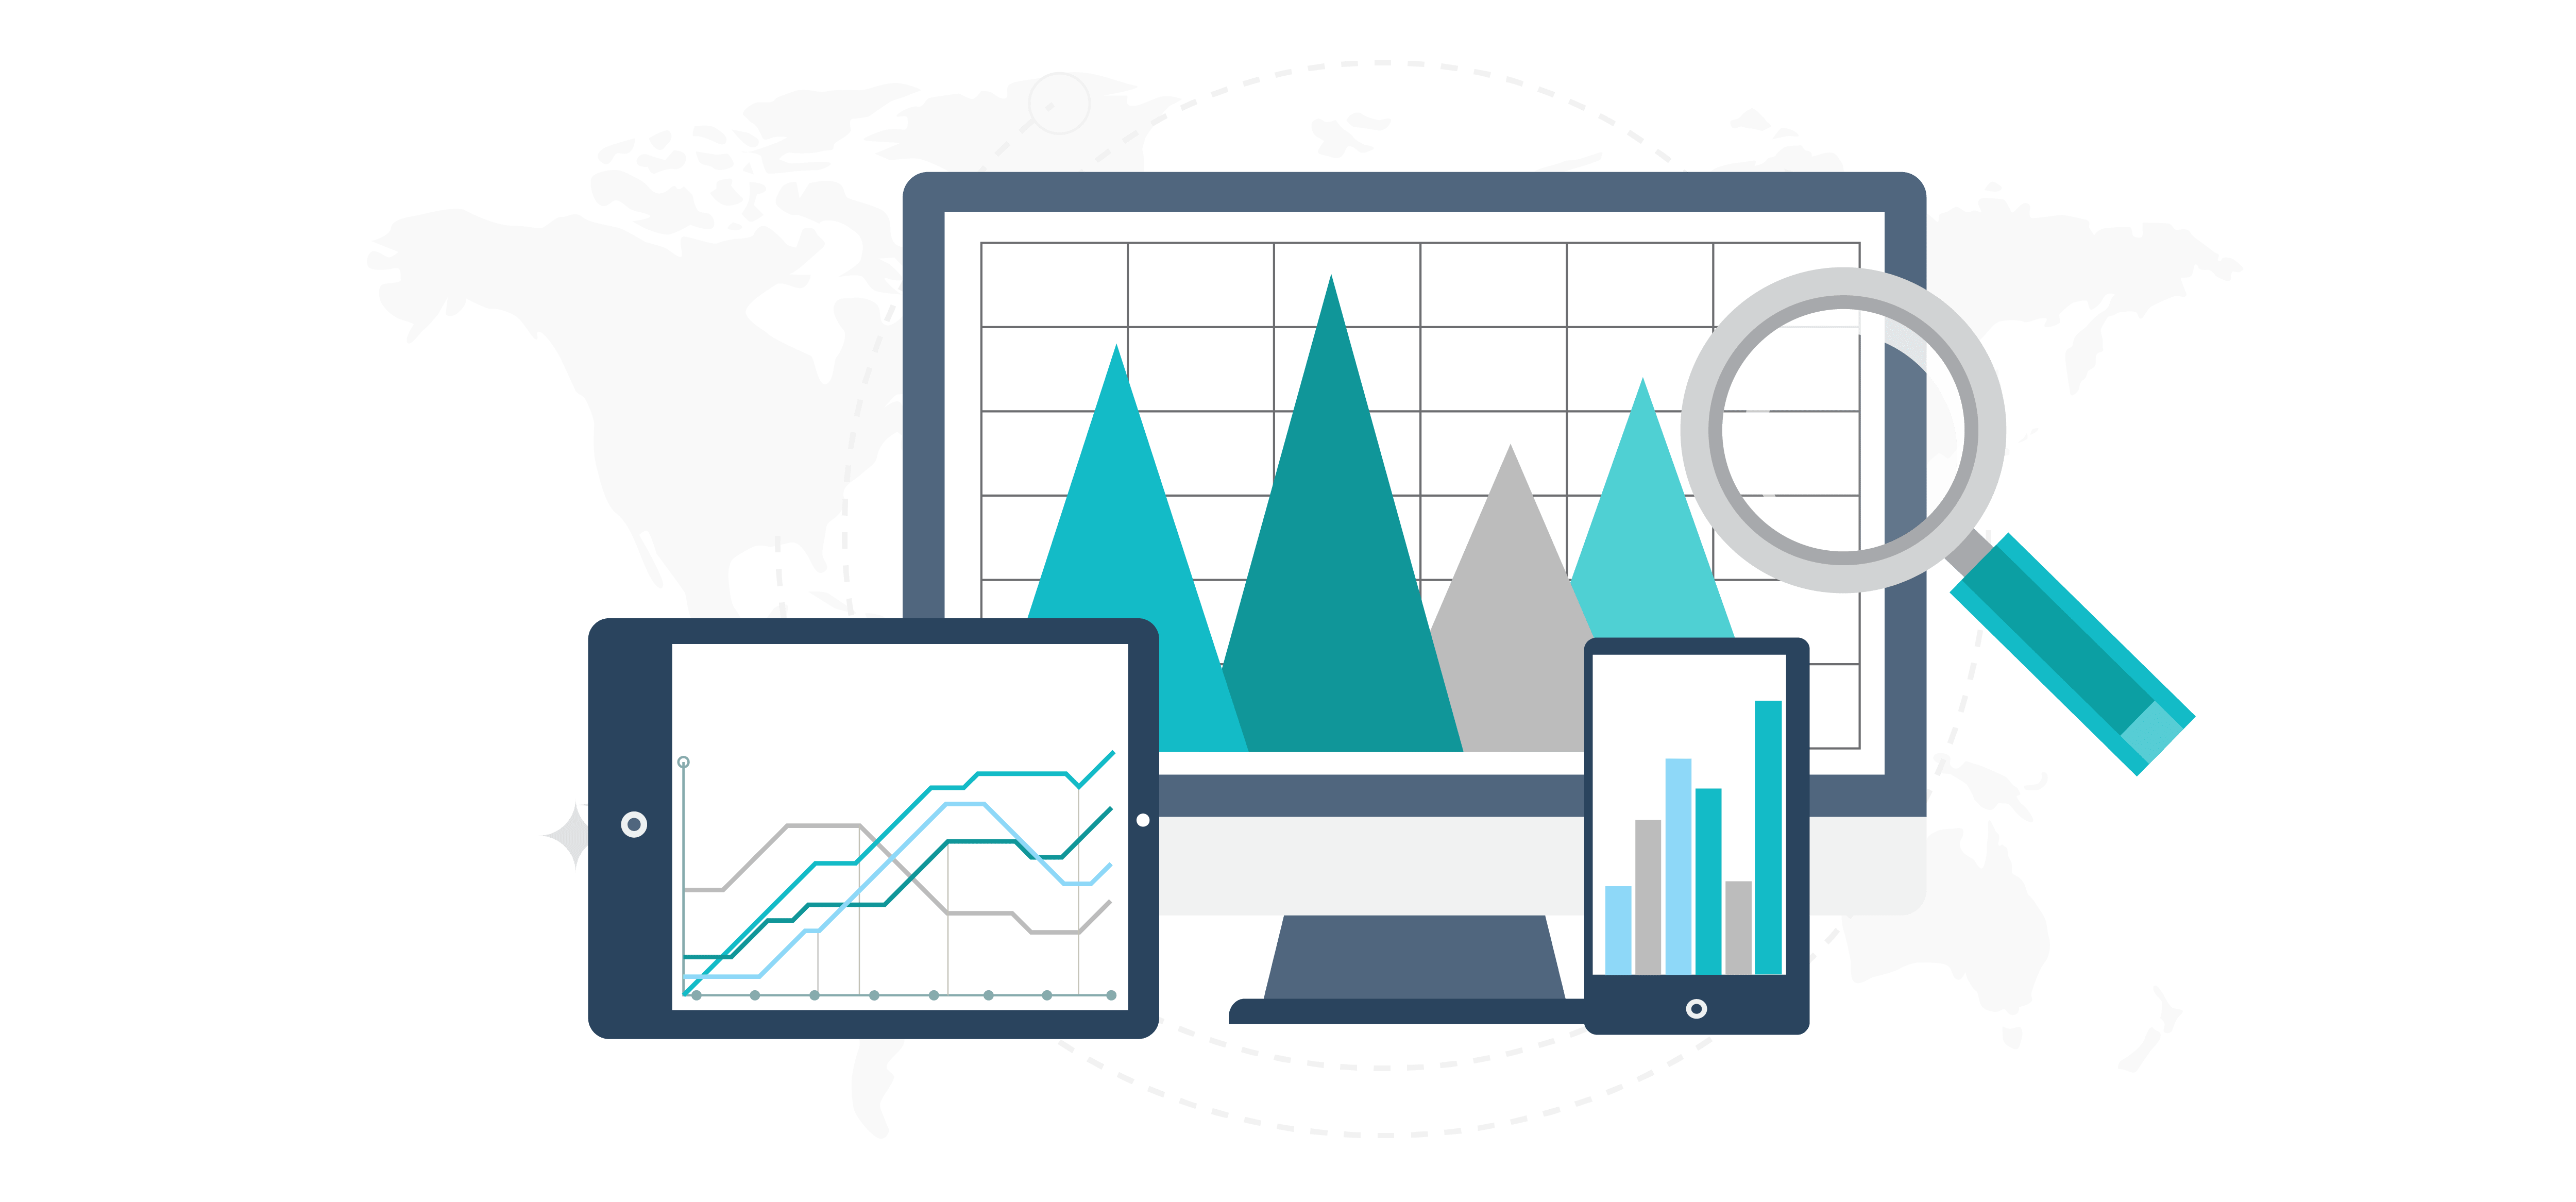 Digital marketing campaign idea. Report clipart action plan